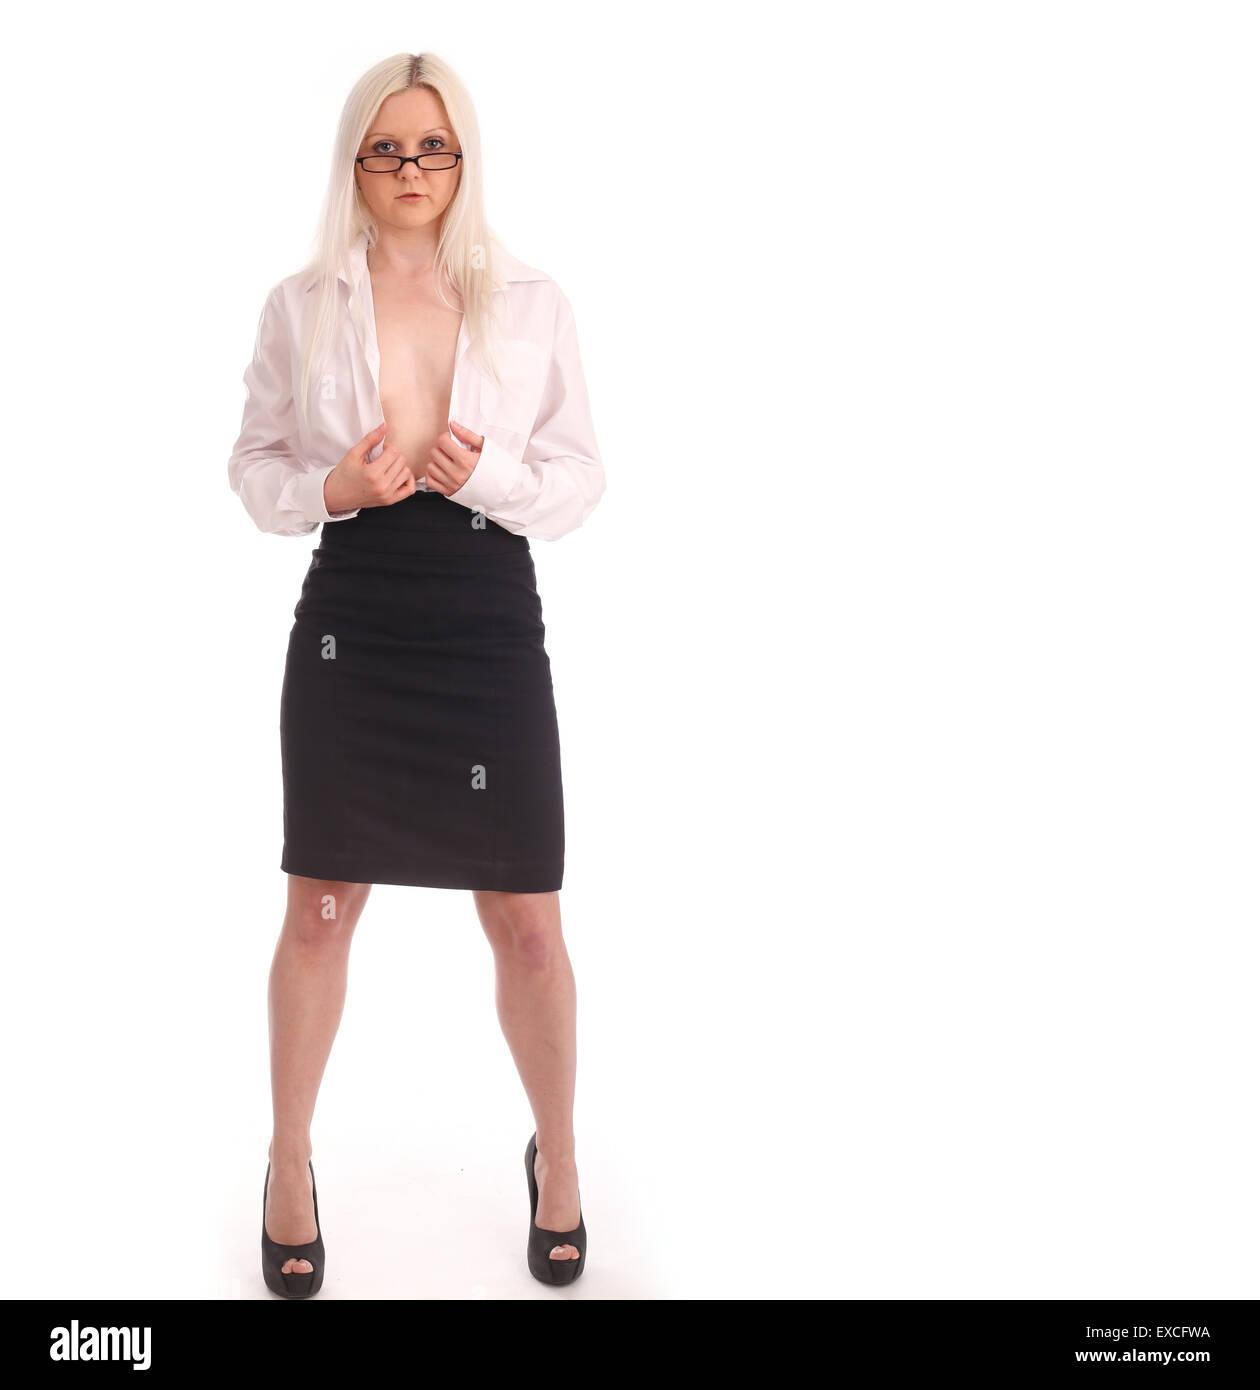 Blondes help undress each other